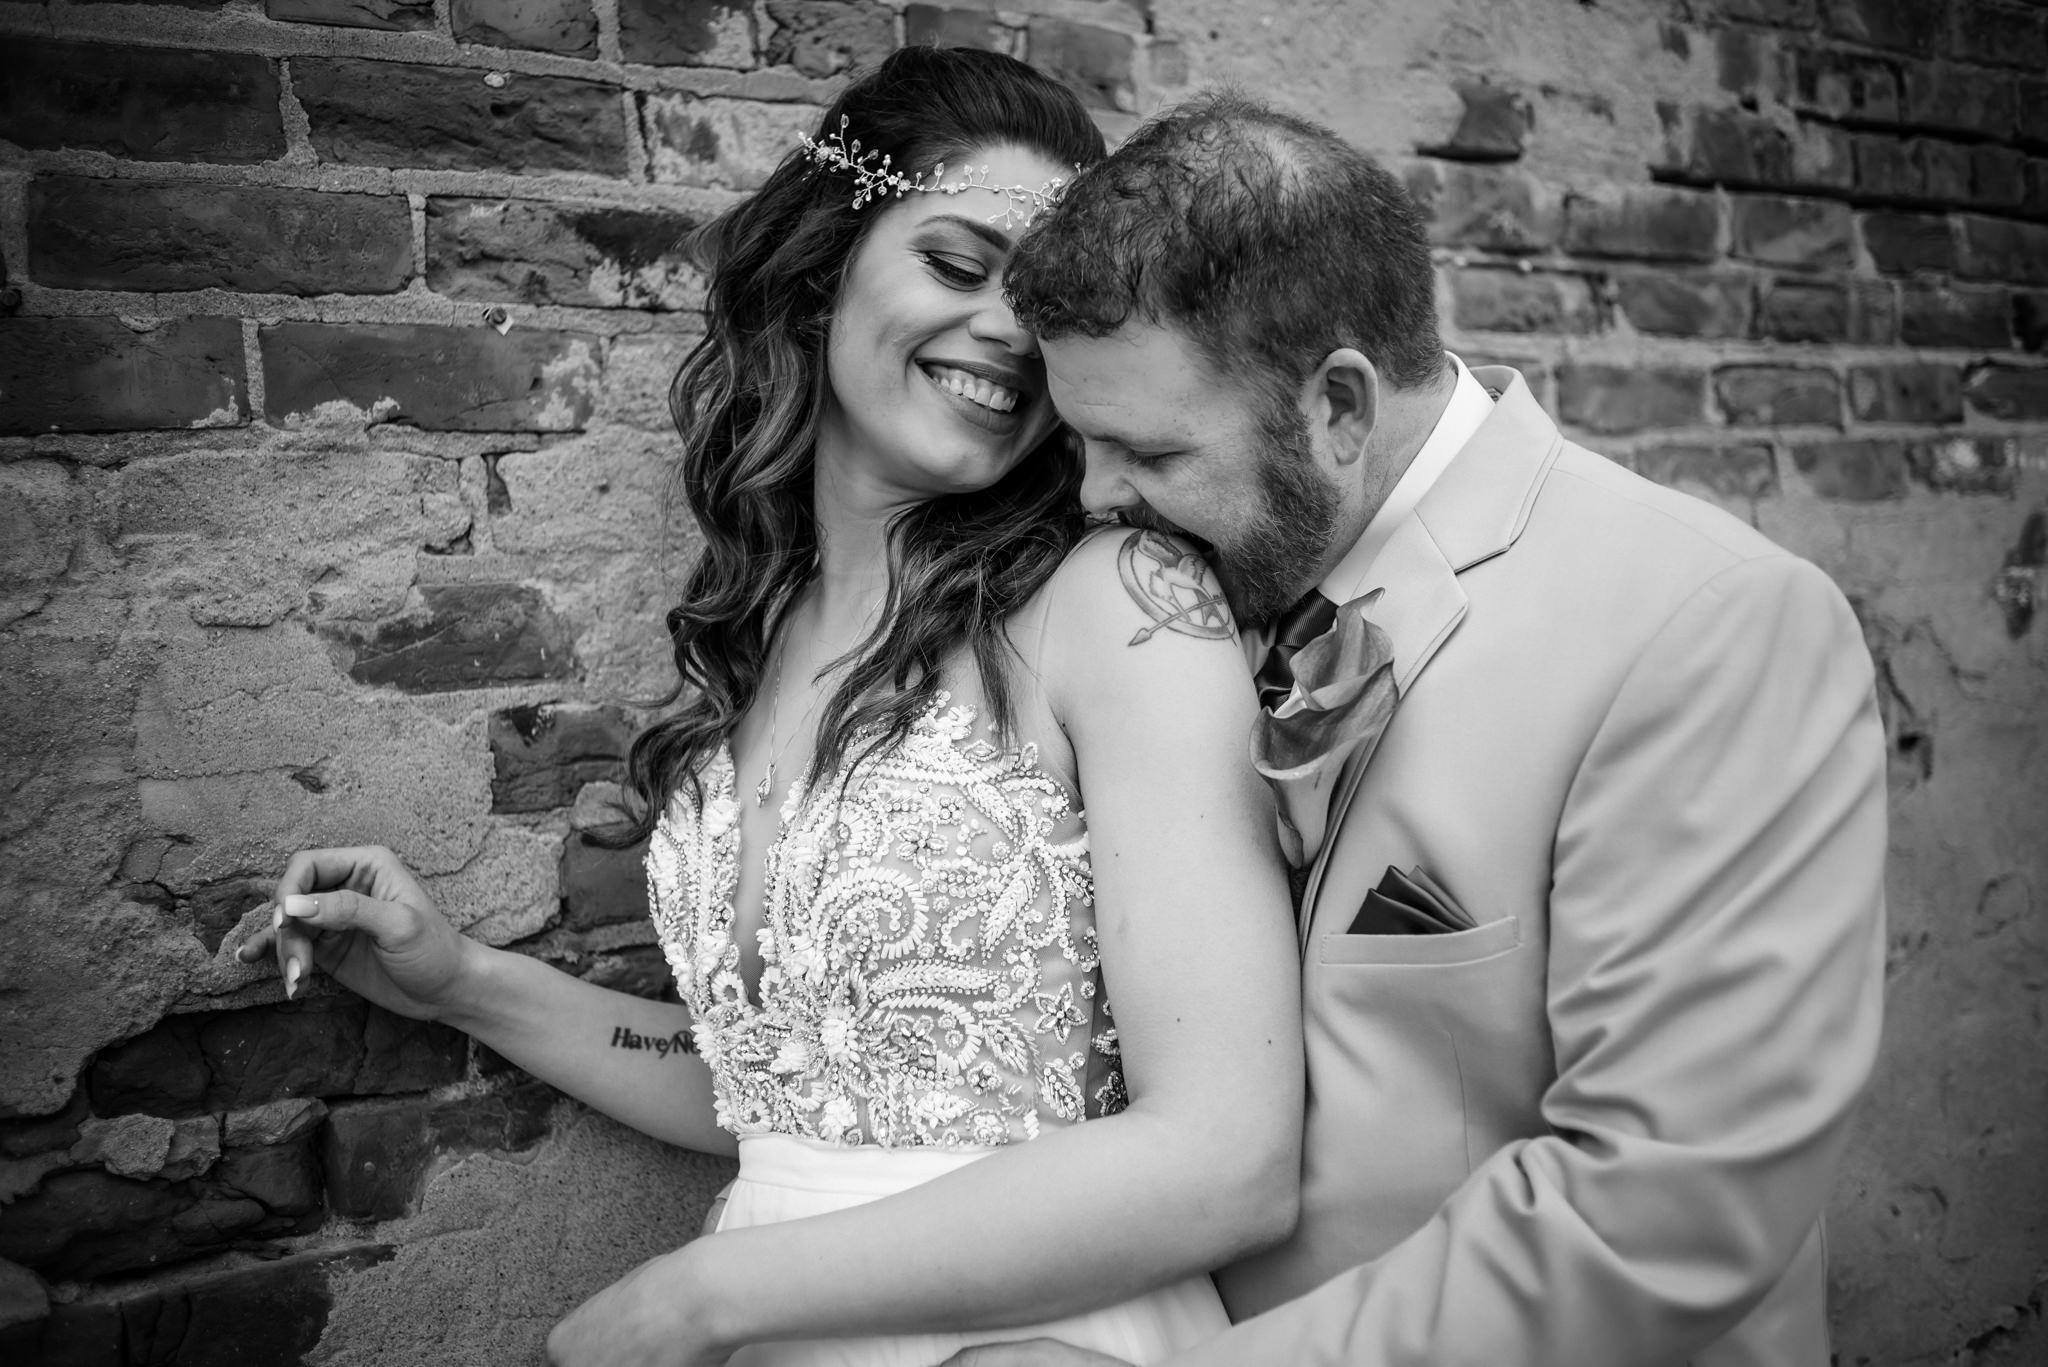 HILTON-OMAHA-WEDDING-PHOTOGRAPHER-JM-STUDIOS-OMAHA-LIV-BRICE-016.jpg